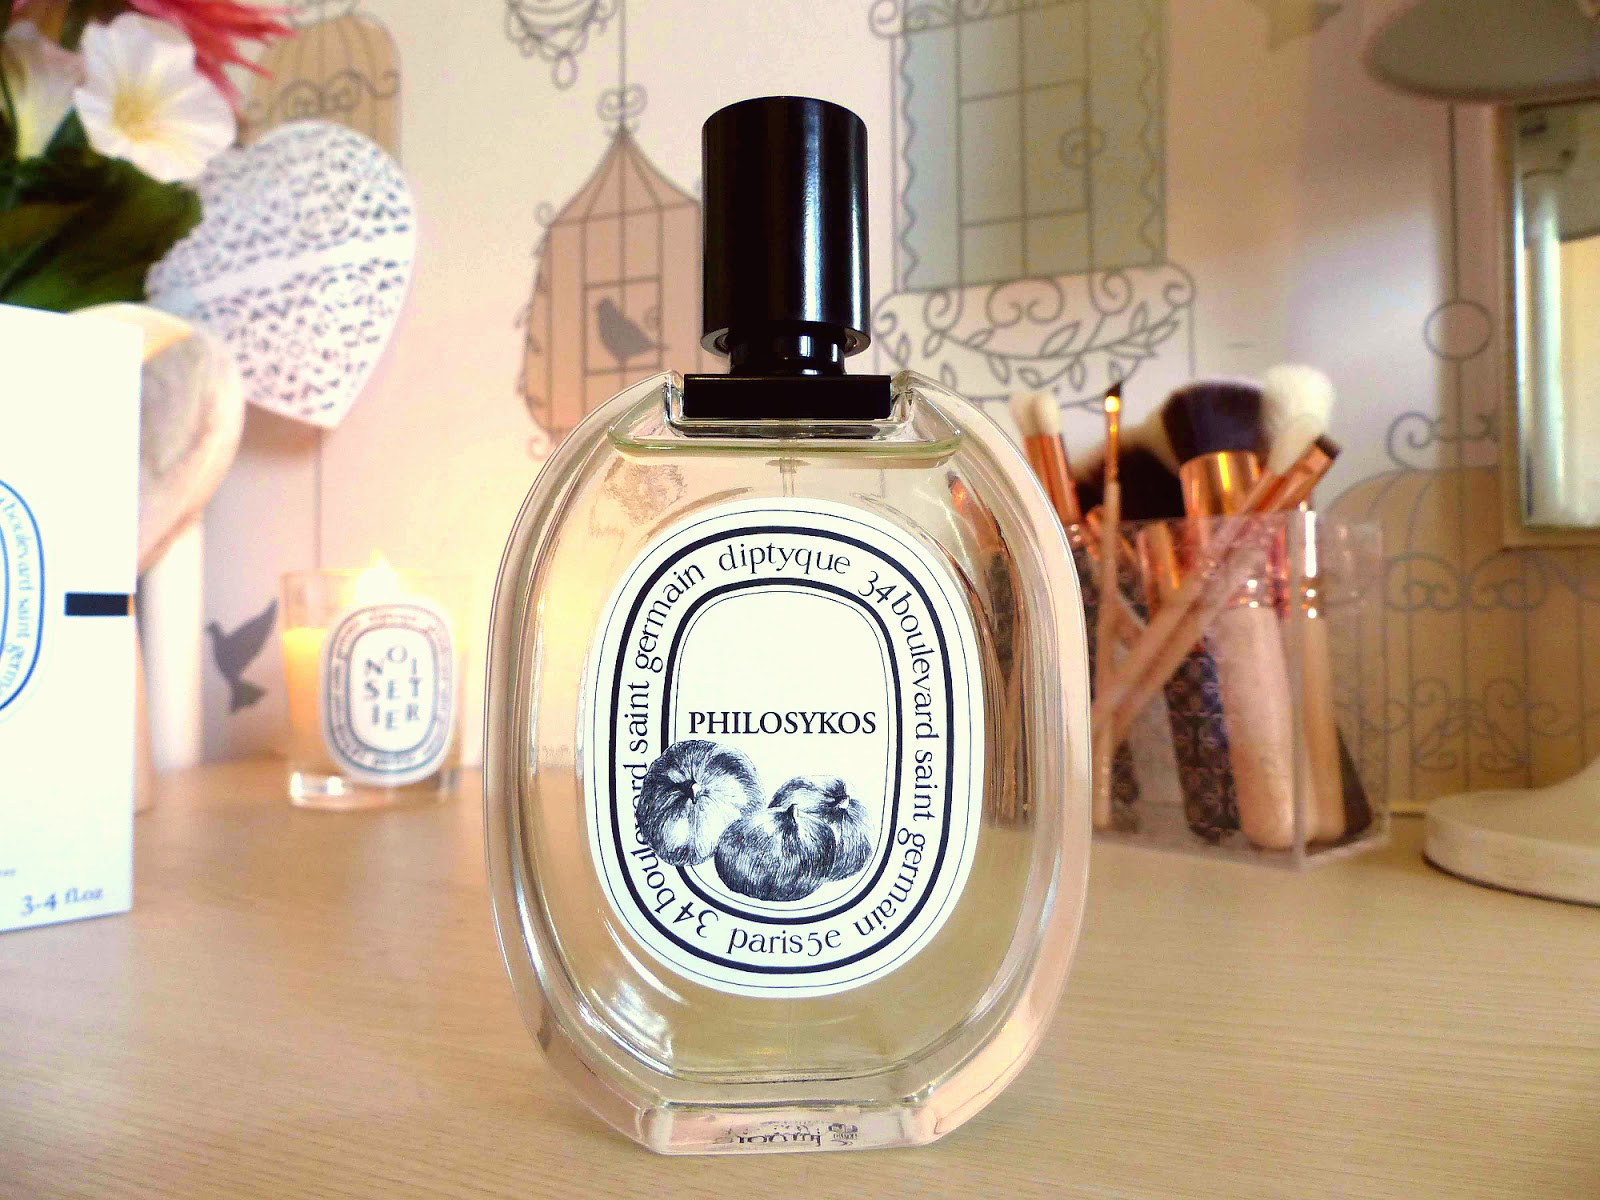 Diptyque Philosykos Eau De Parfum.If You Only Buy One Fragrance For Summer Jasmine Talks Beauty